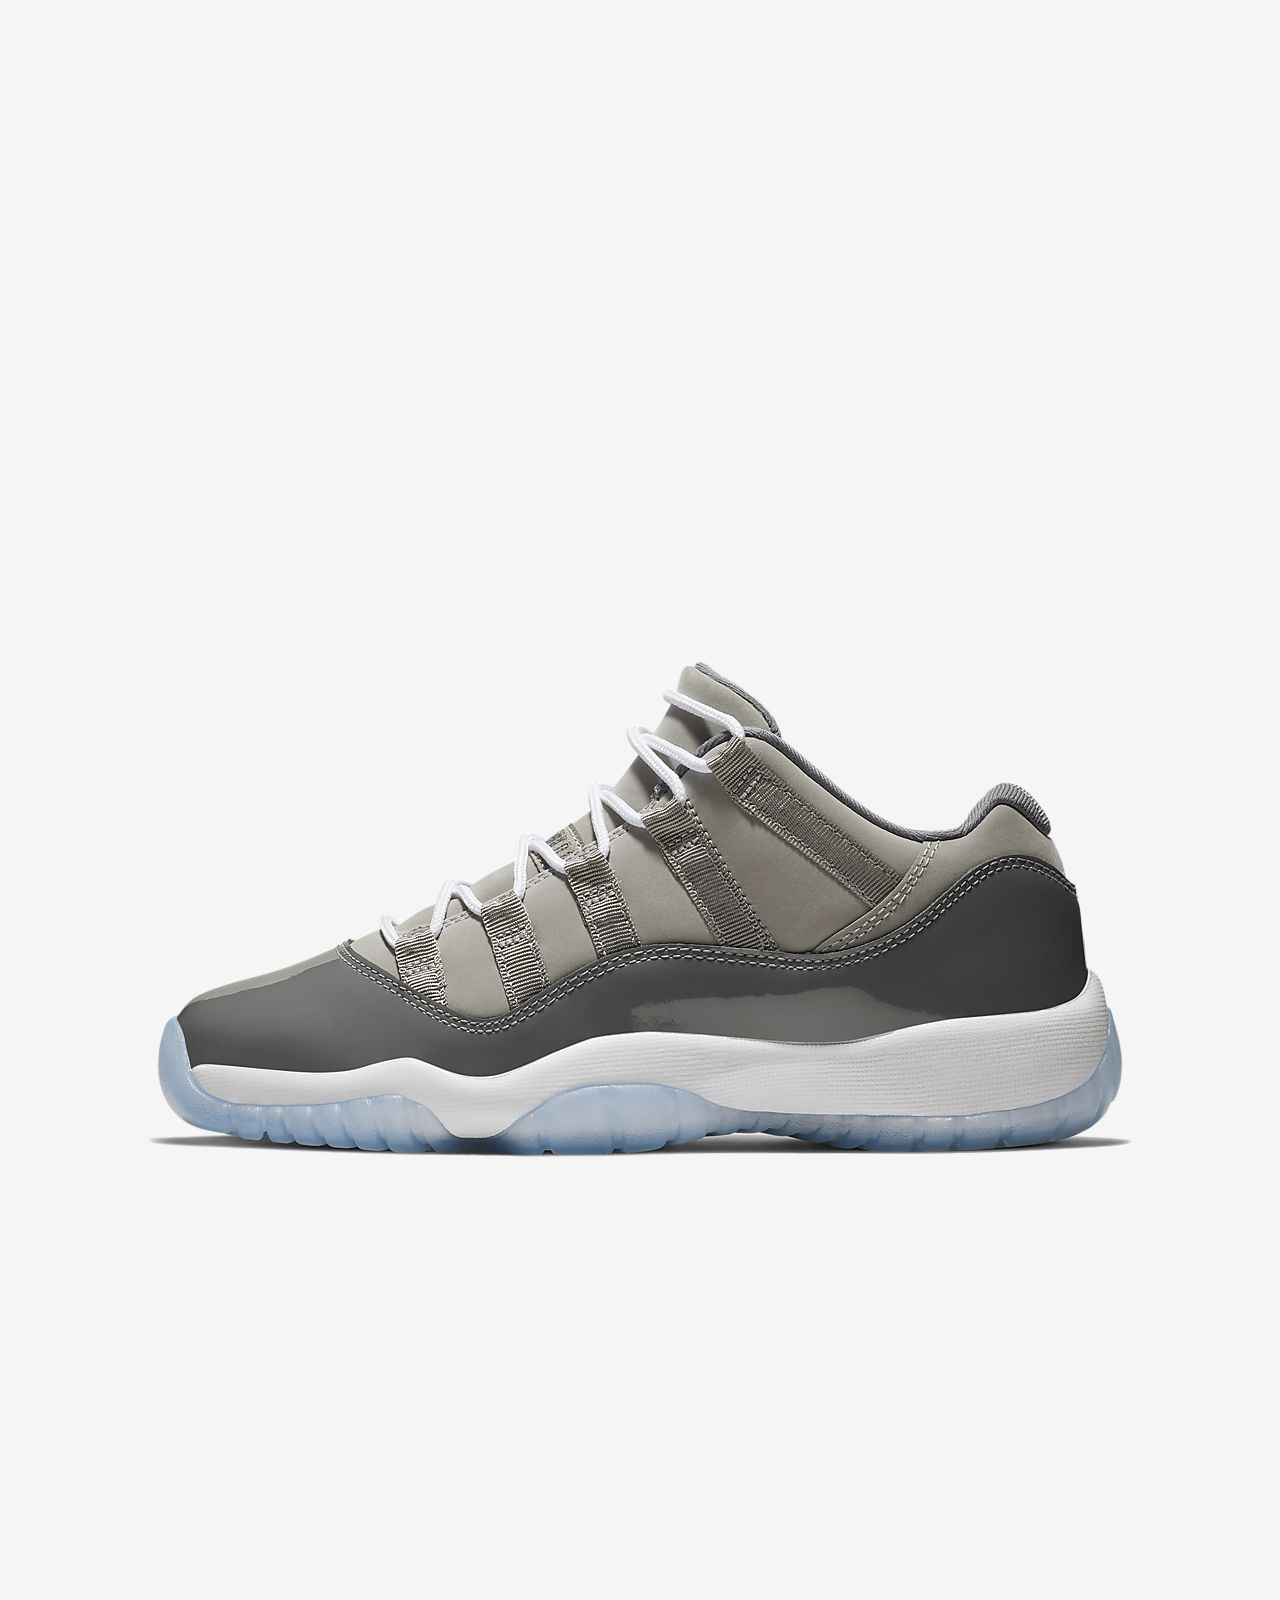 info for 890bc 4d74c Air Jordan 11 Retro Low Older Kids' Shoe